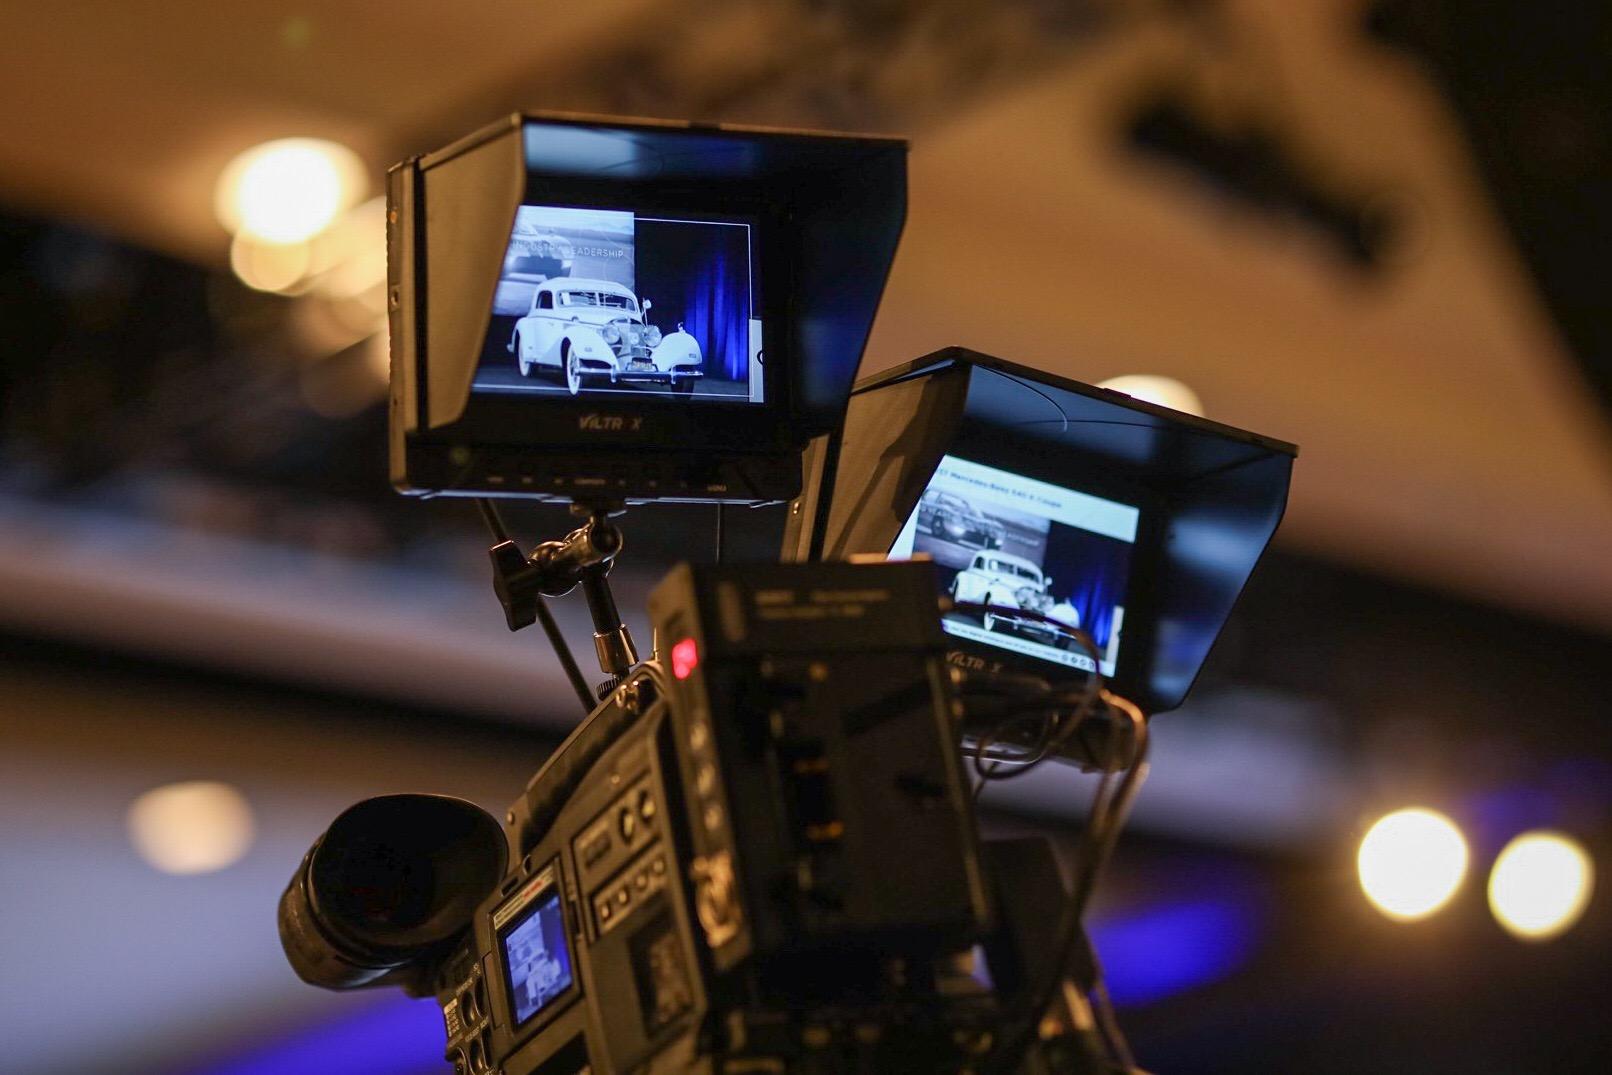 Mercedes-Benz 540 K cameras at sale